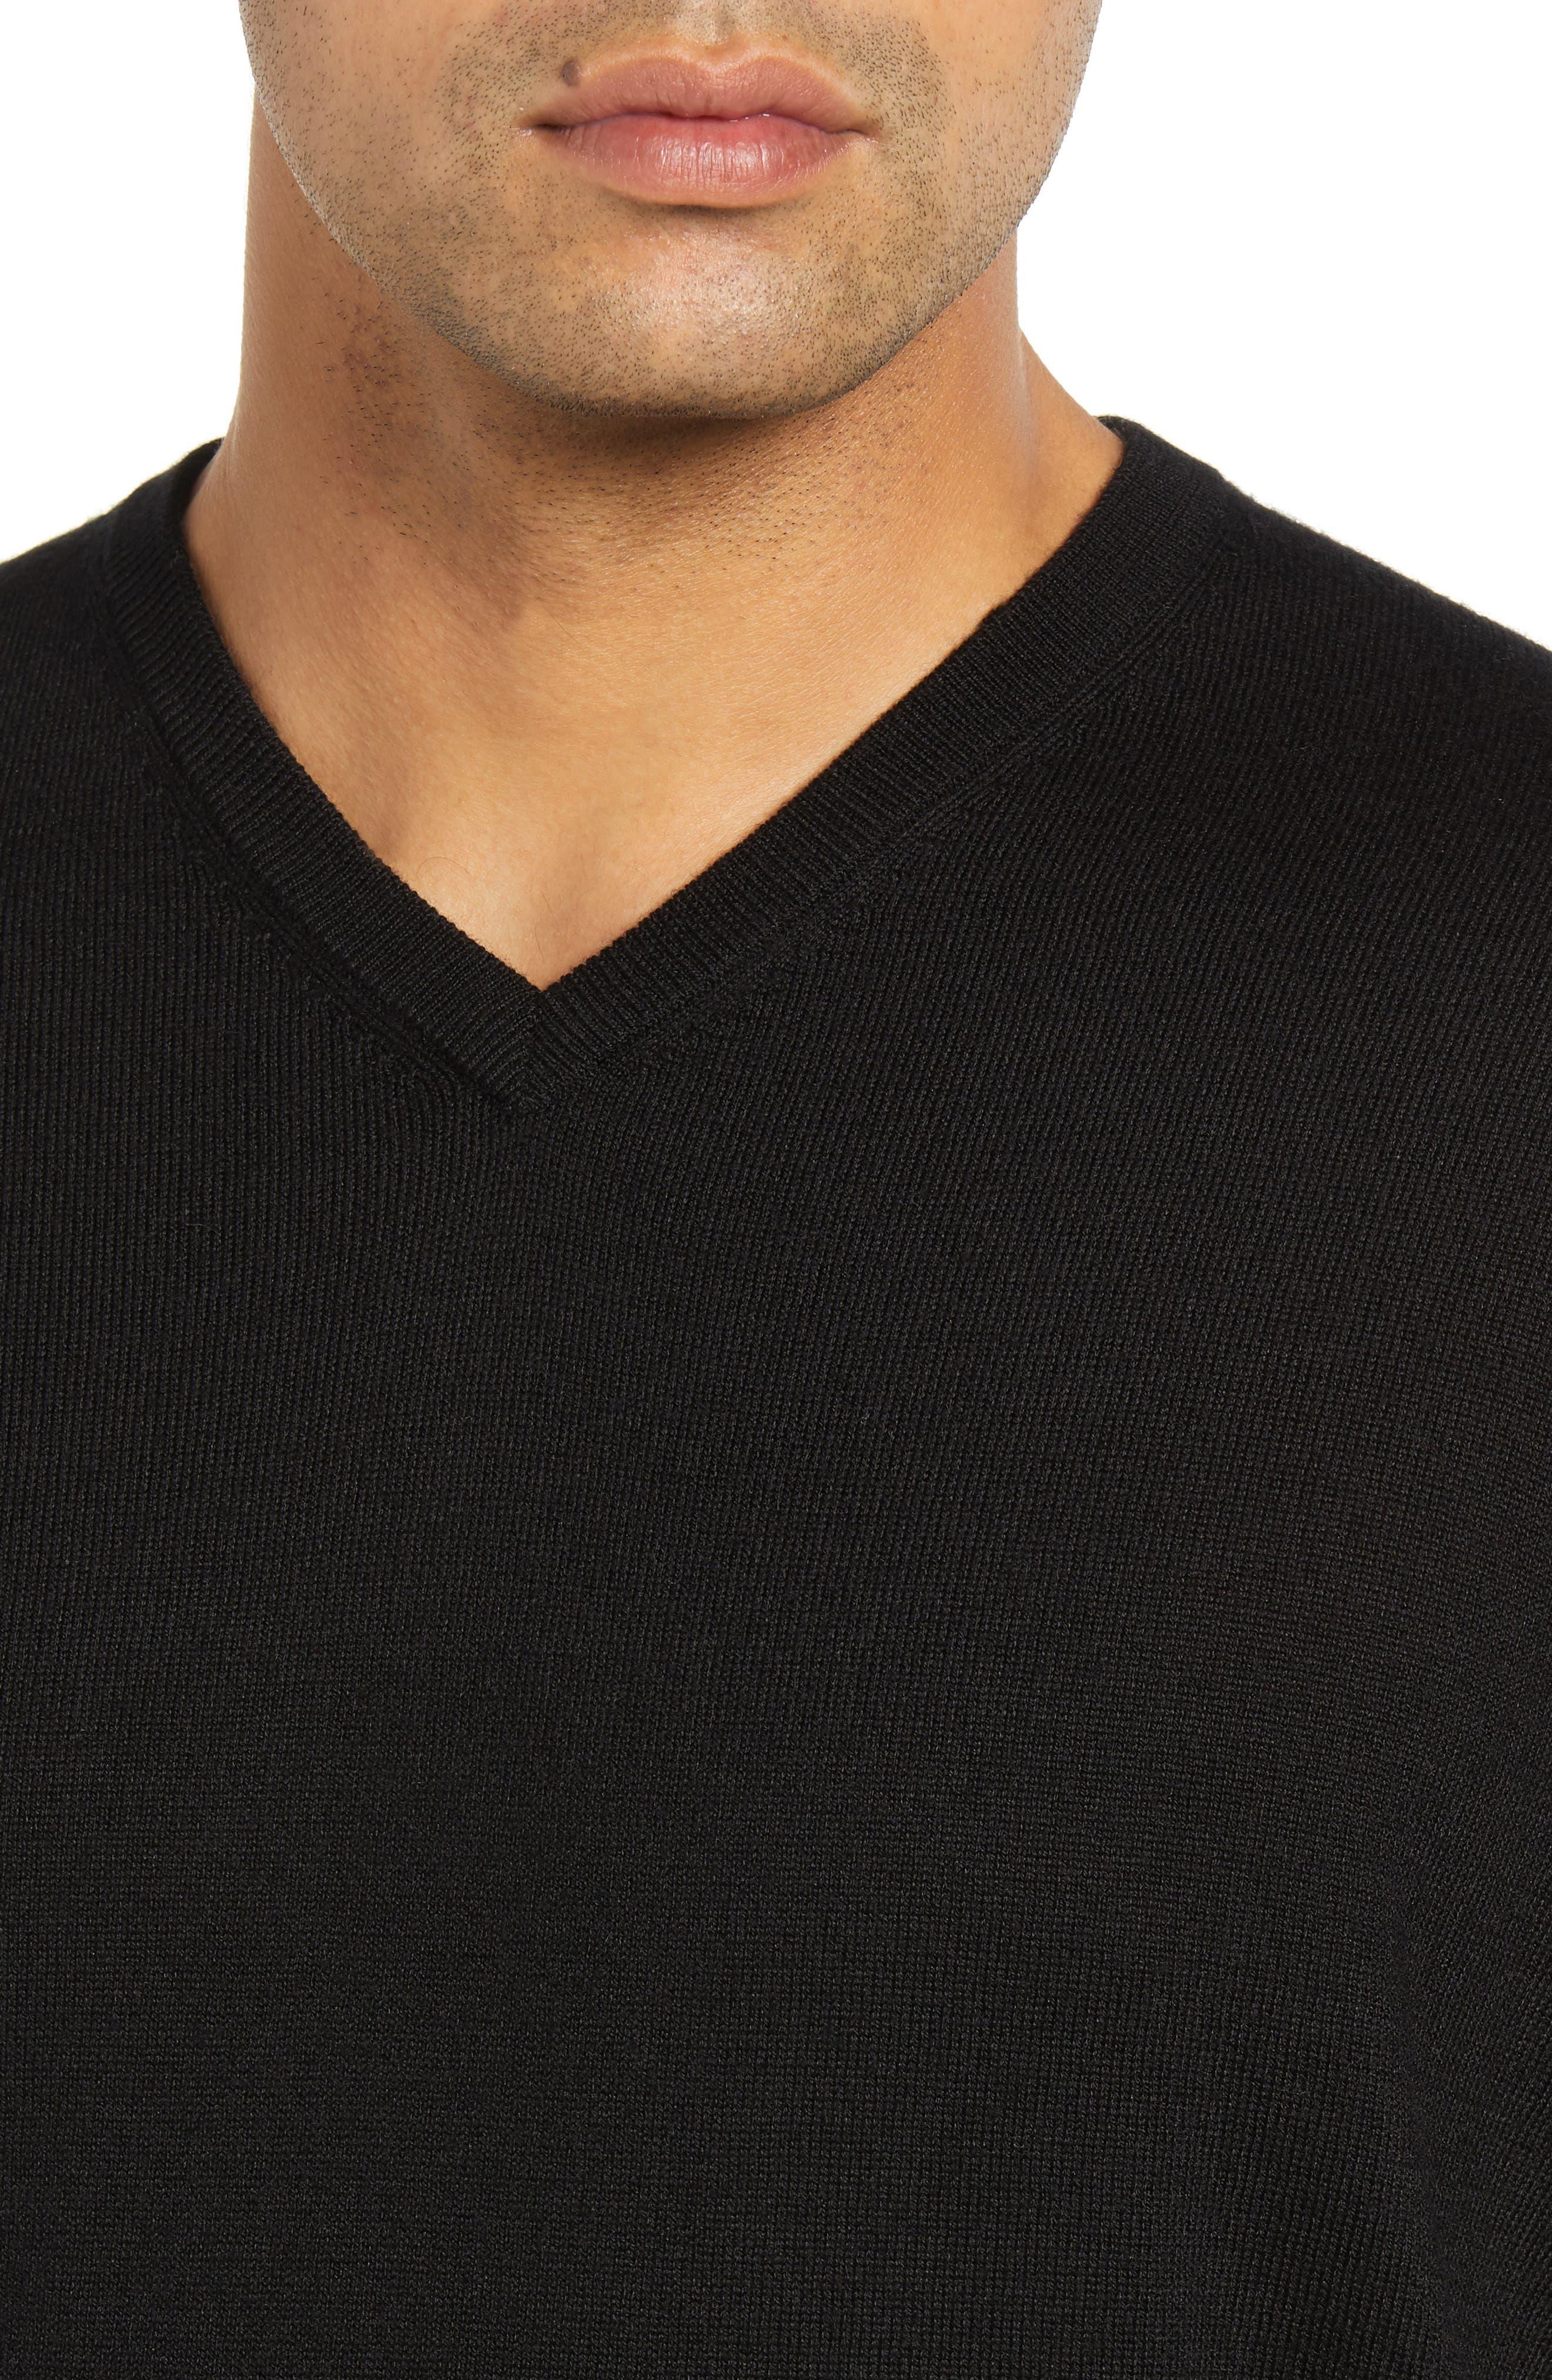 Wool & Silk V-Neck Sweater,                             Alternate thumbnail 4, color,                             001